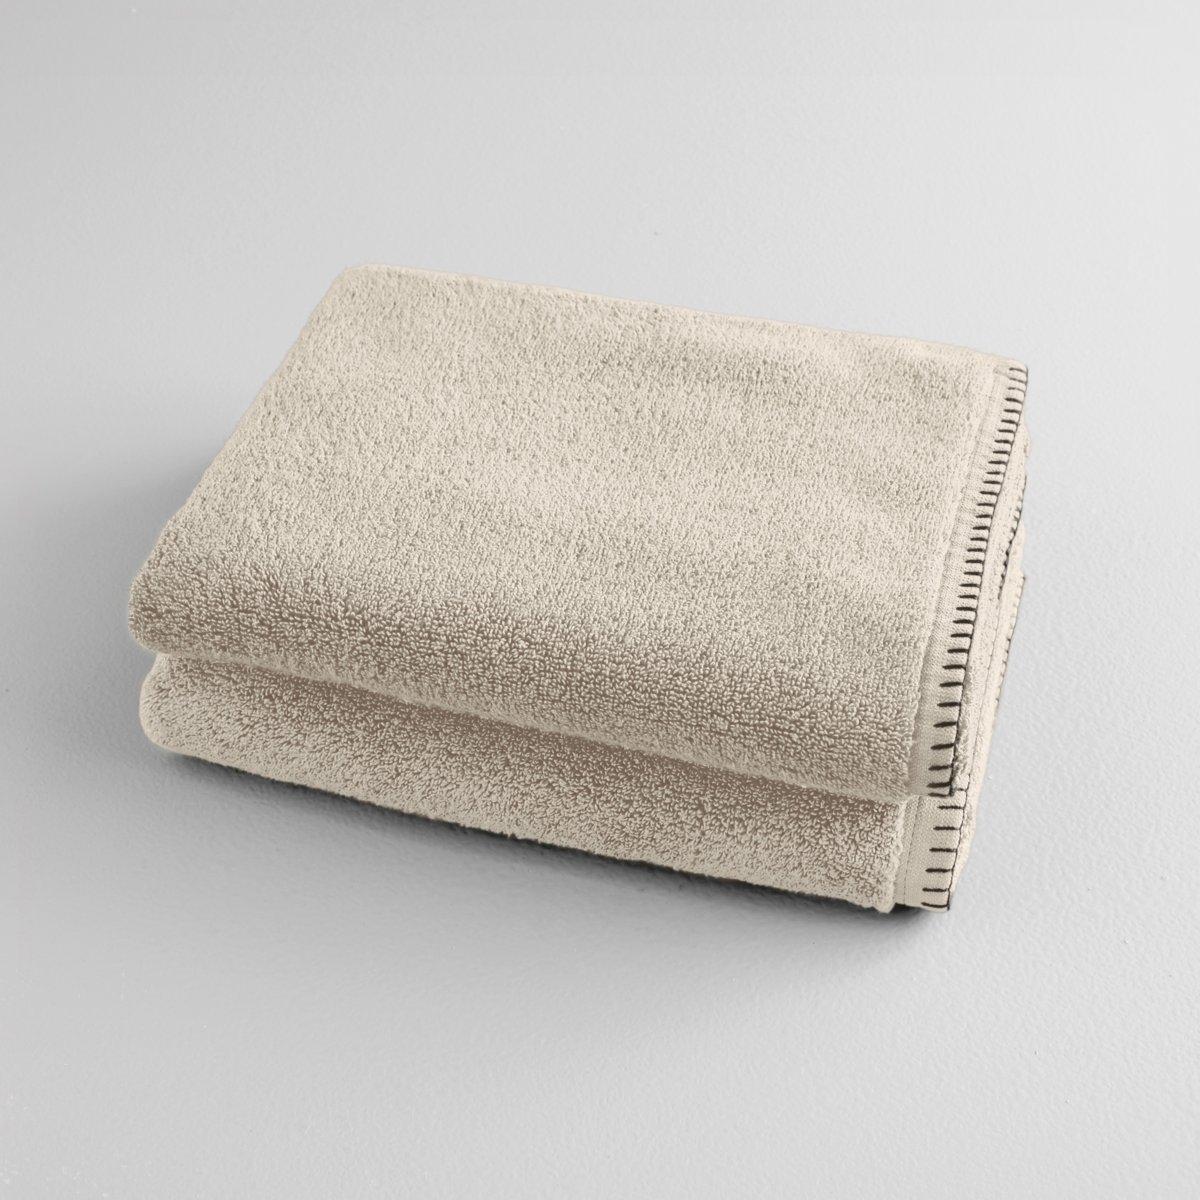 2 полотенца Kyla